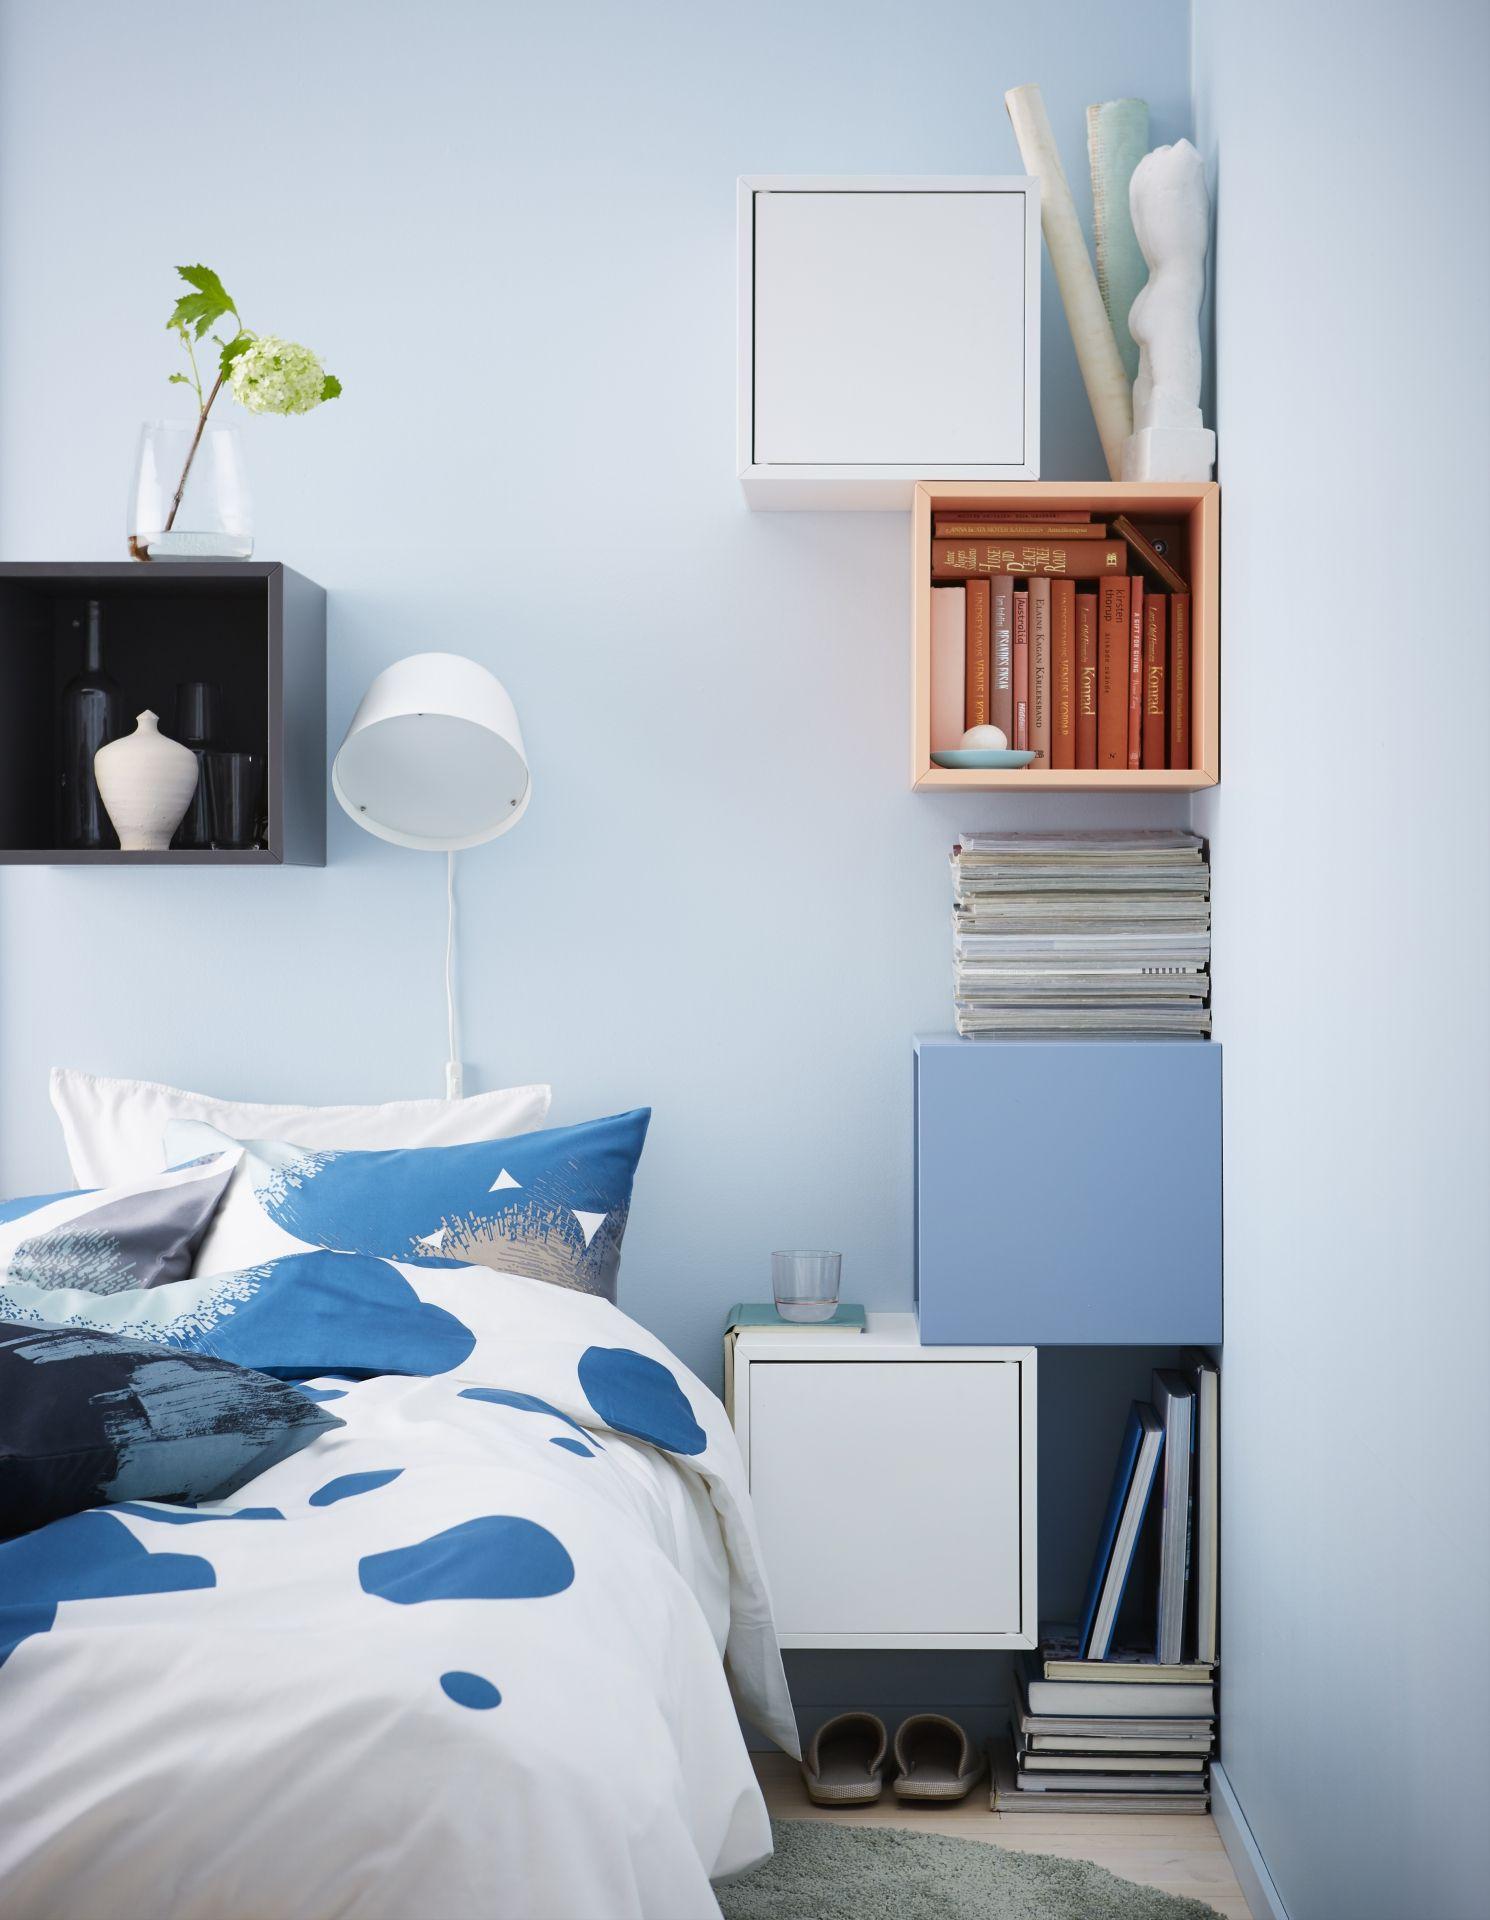 Schlafzimmer Ikea Weiß | flamencon.com